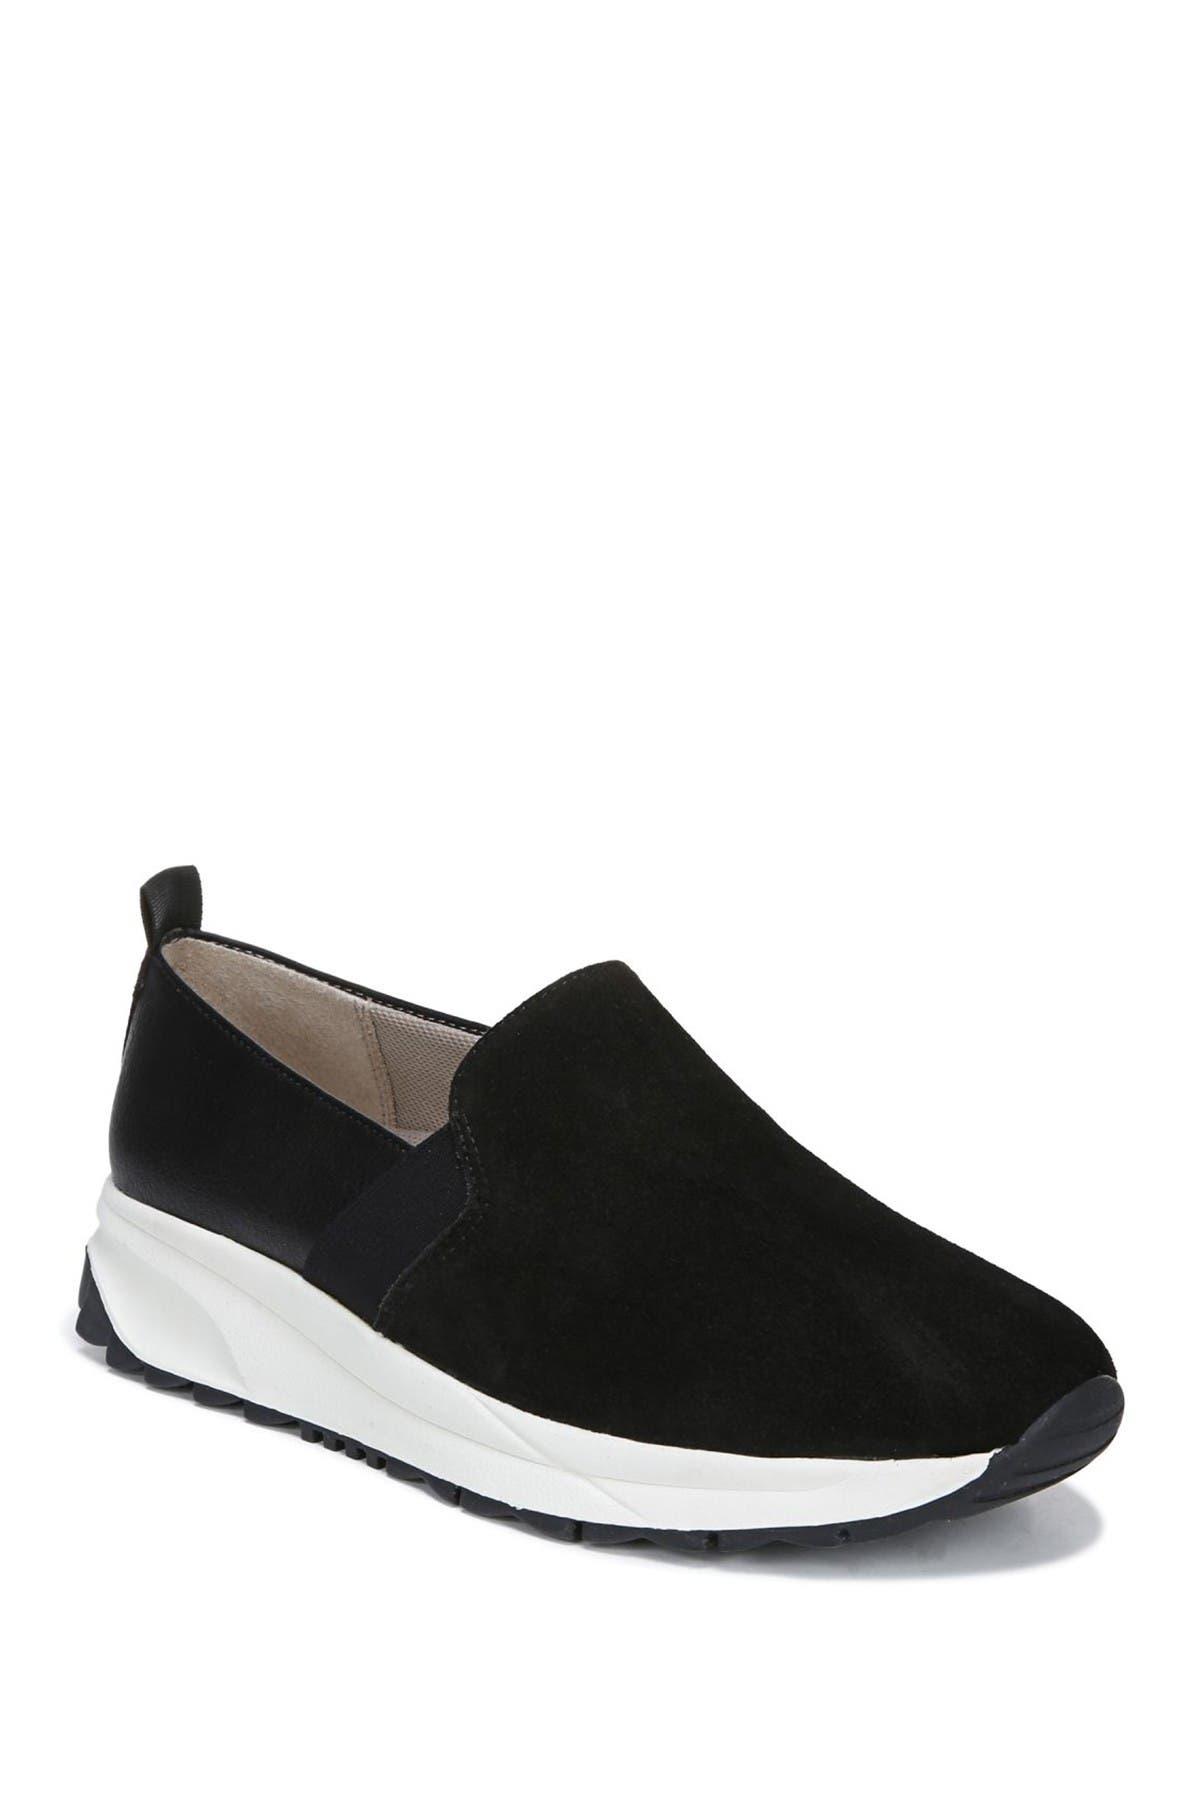 Naturalizer | Norine Slip-On Sneaker